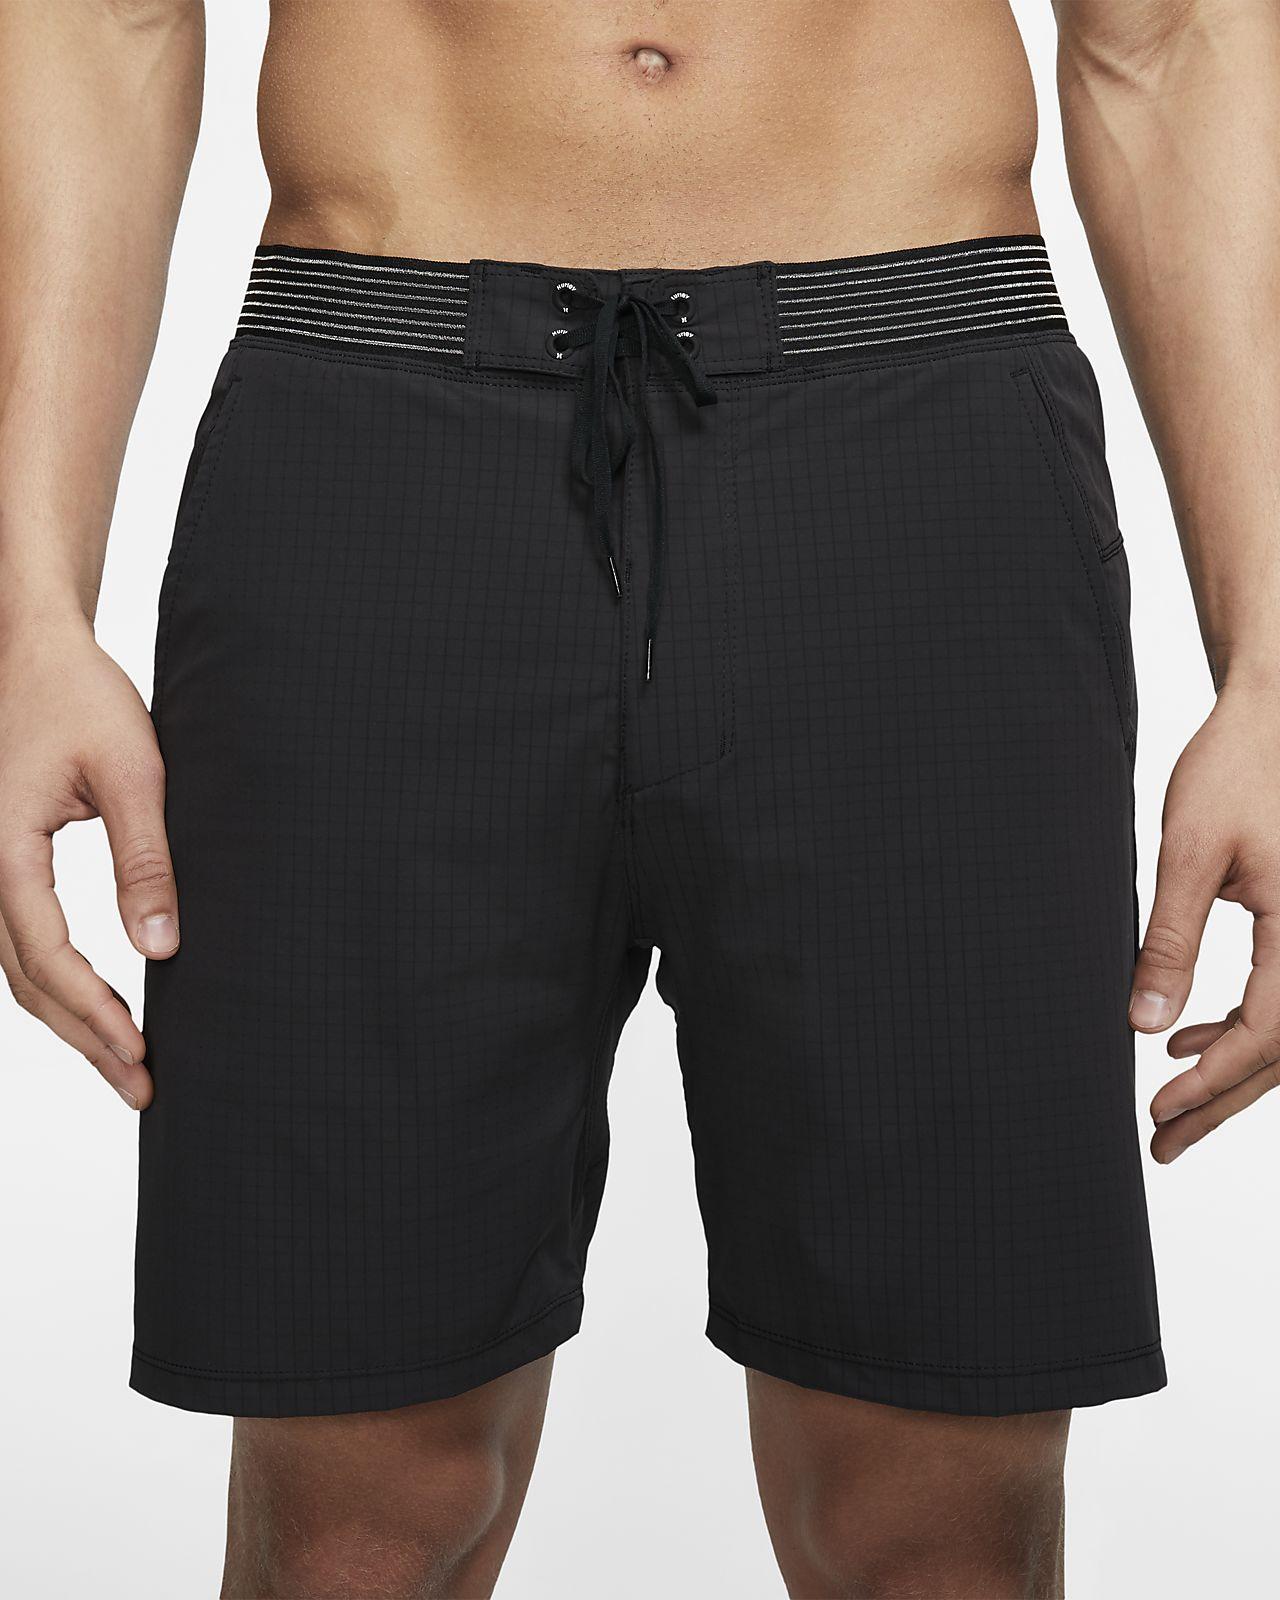 "Hurley Phantom Alpha Trainer Plus Men's 18"" 2-In-1 Shorts"